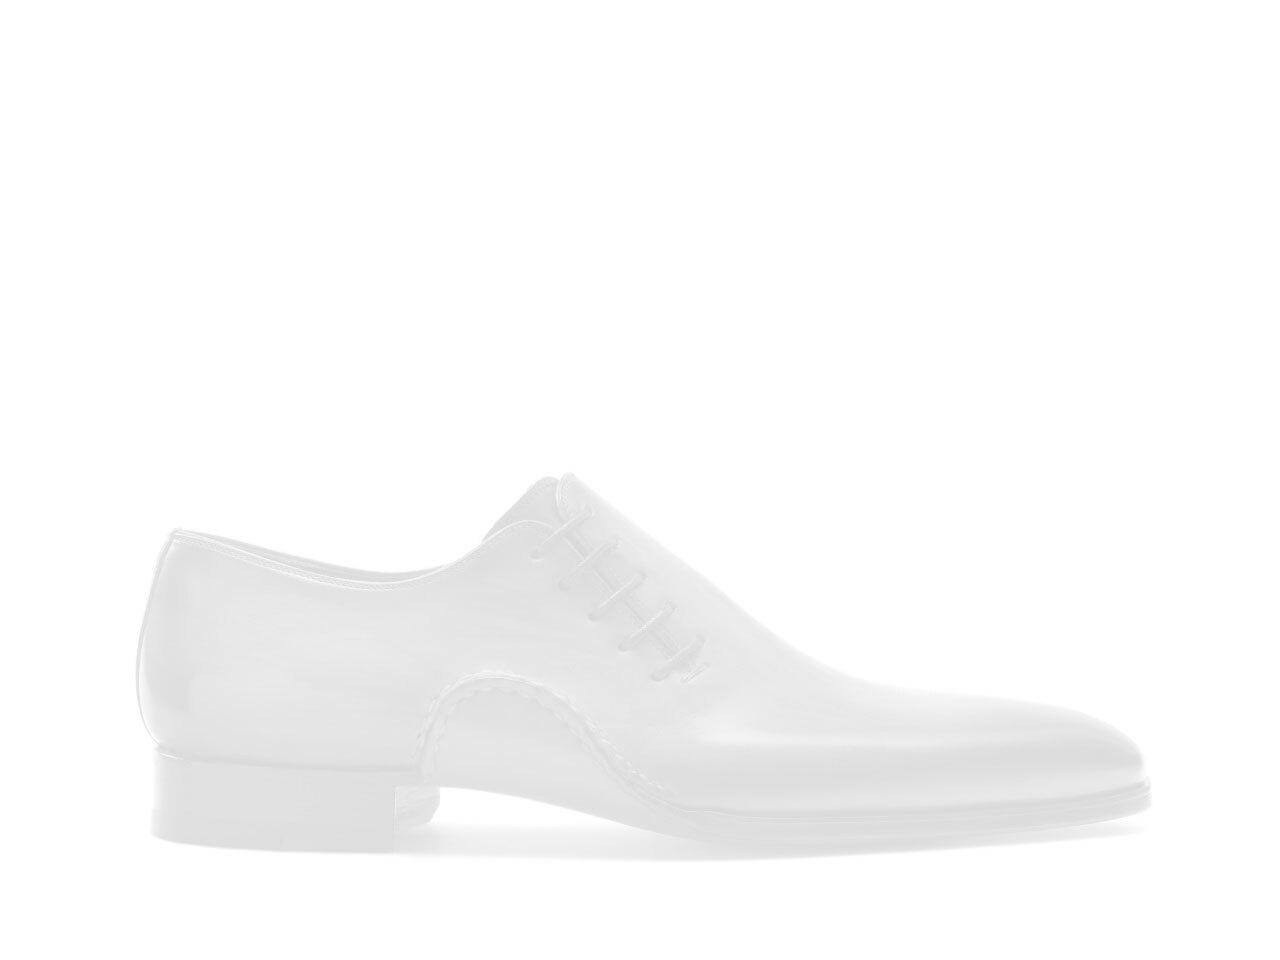 Sole of the Magnanni Sapor Black Men's Sneakers